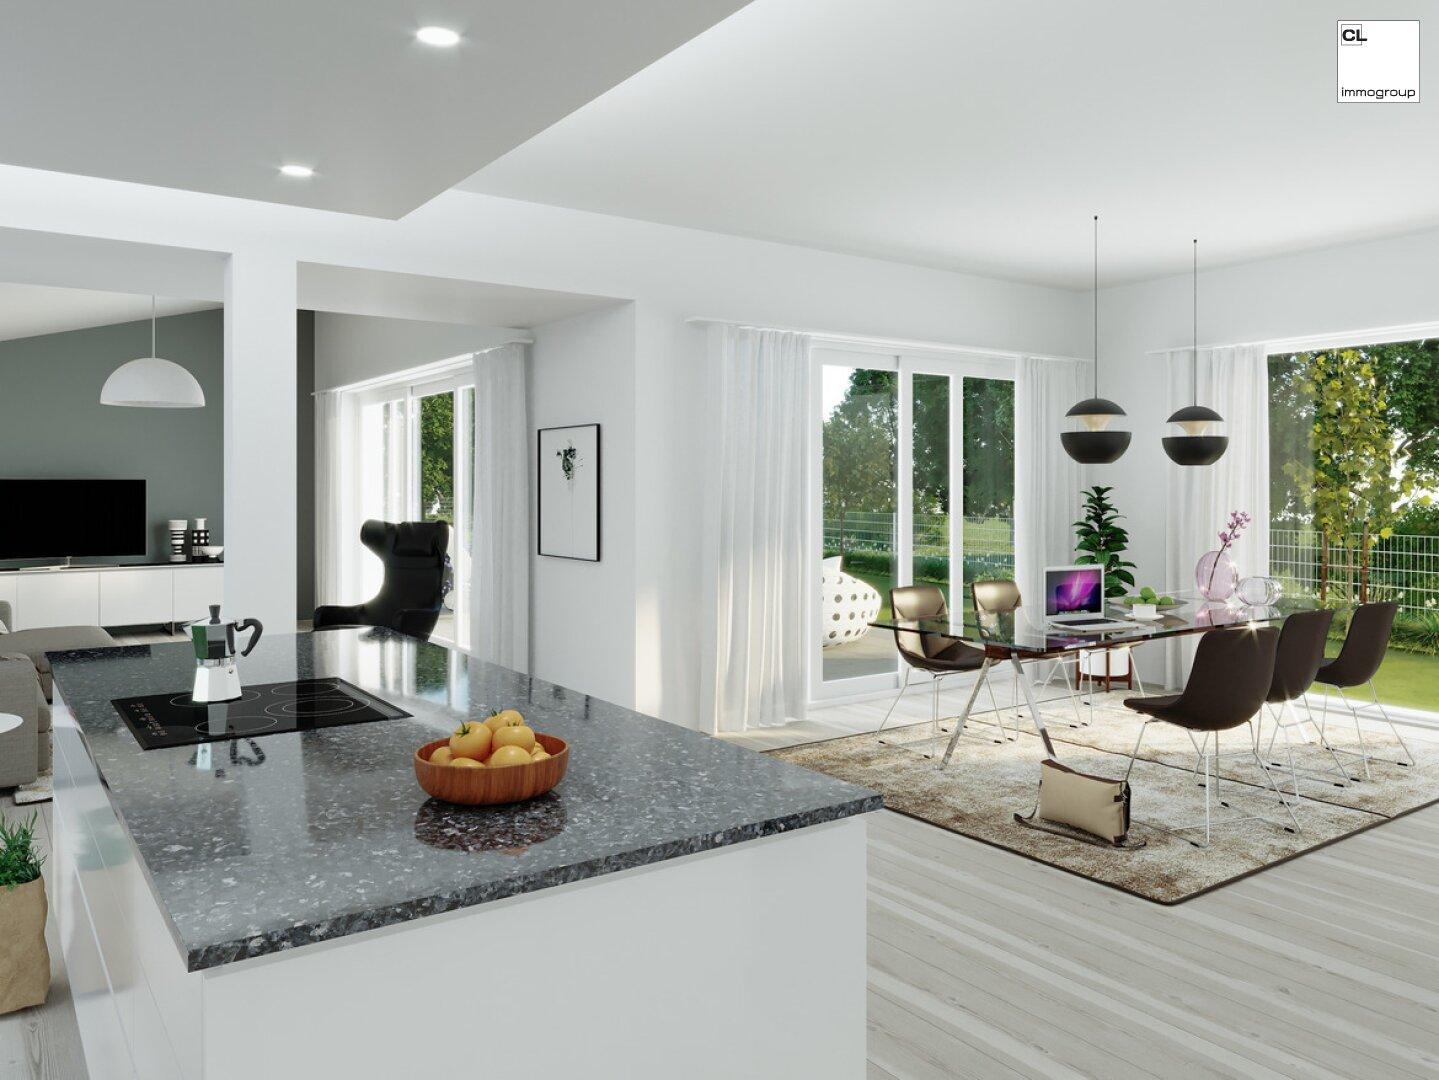 Imagebild Küche